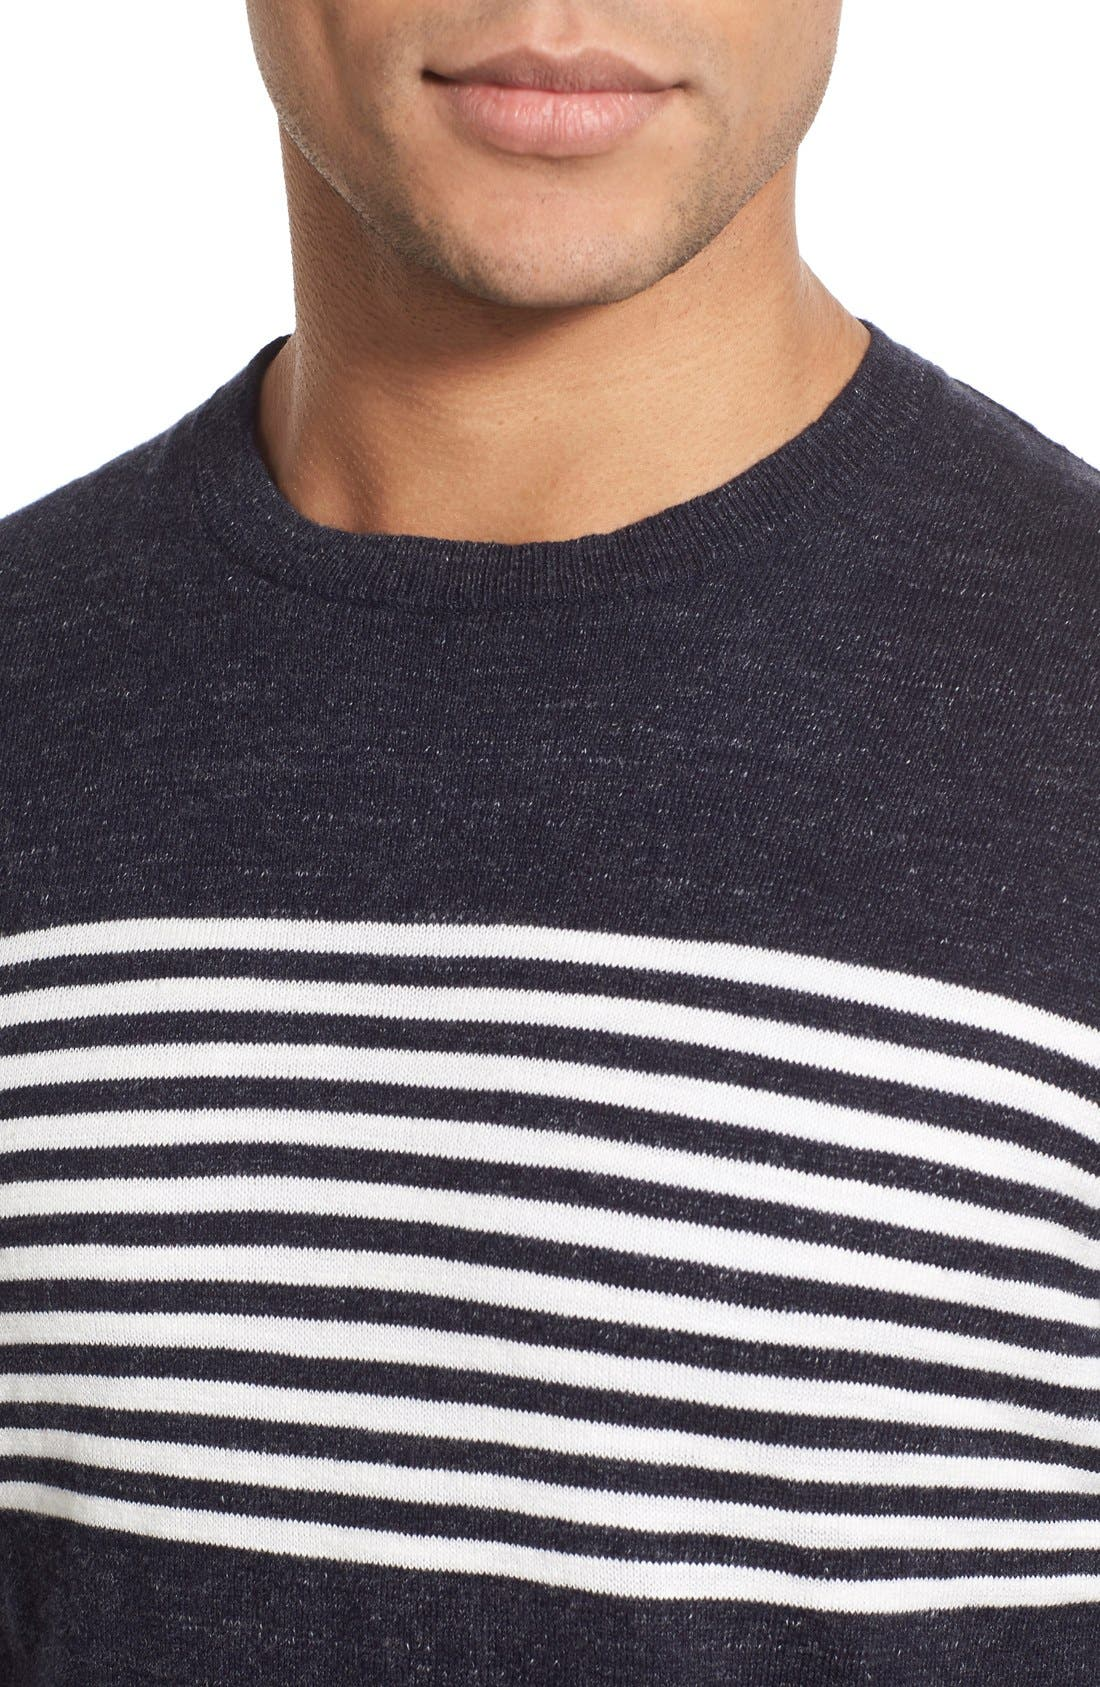 'Shore Club' Chest Stripe Crewneck Sweater,                             Alternate thumbnail 4, color,                             Navy